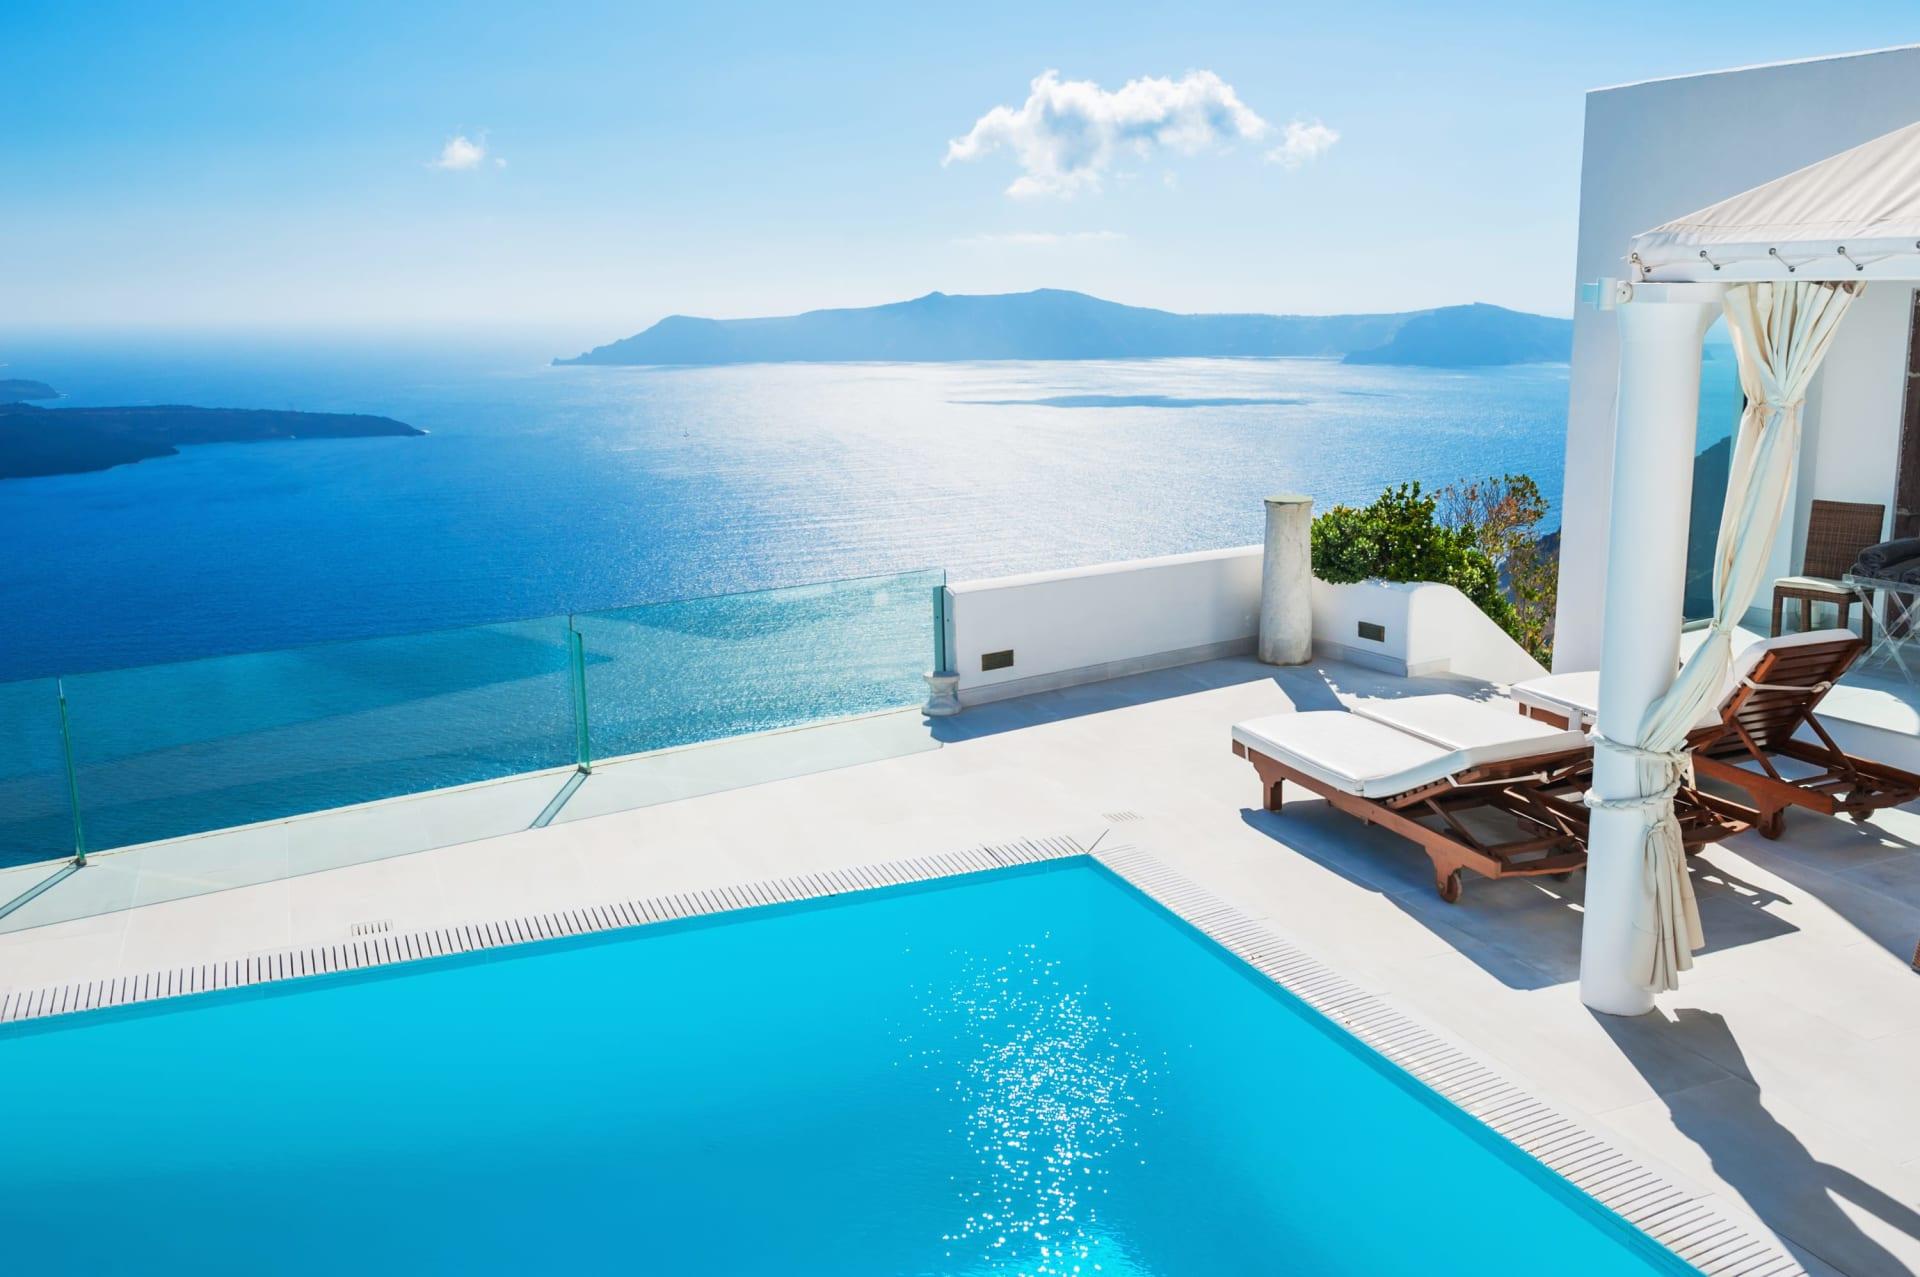 Wellness Travel- The Luxury Trend Gaining Popularity